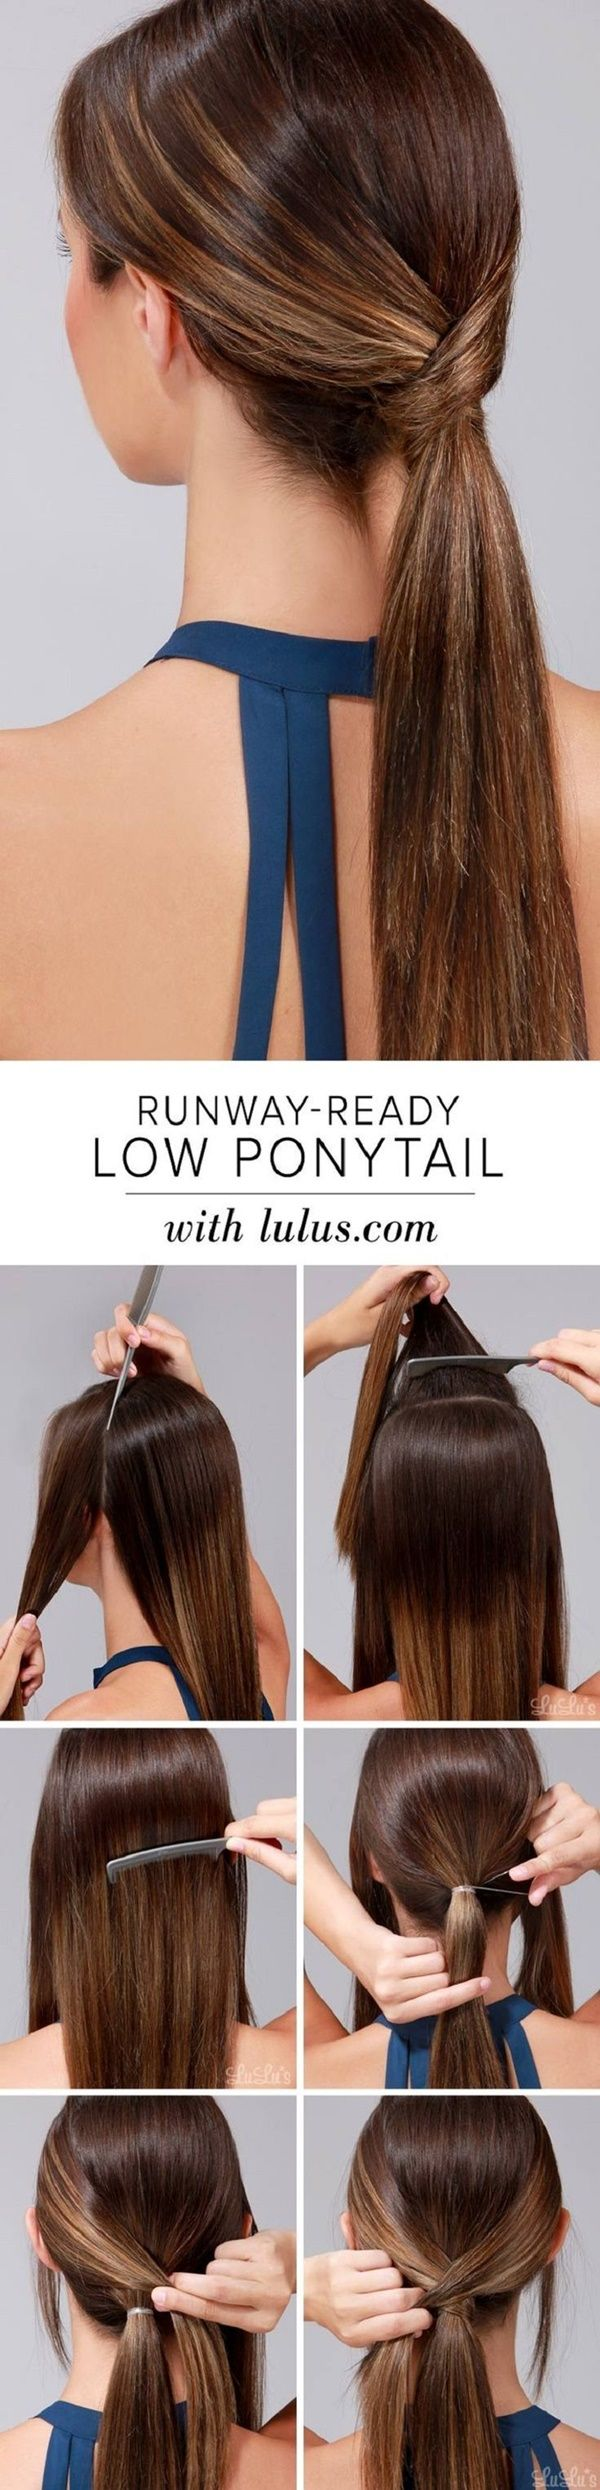 simple & easy hairstyles